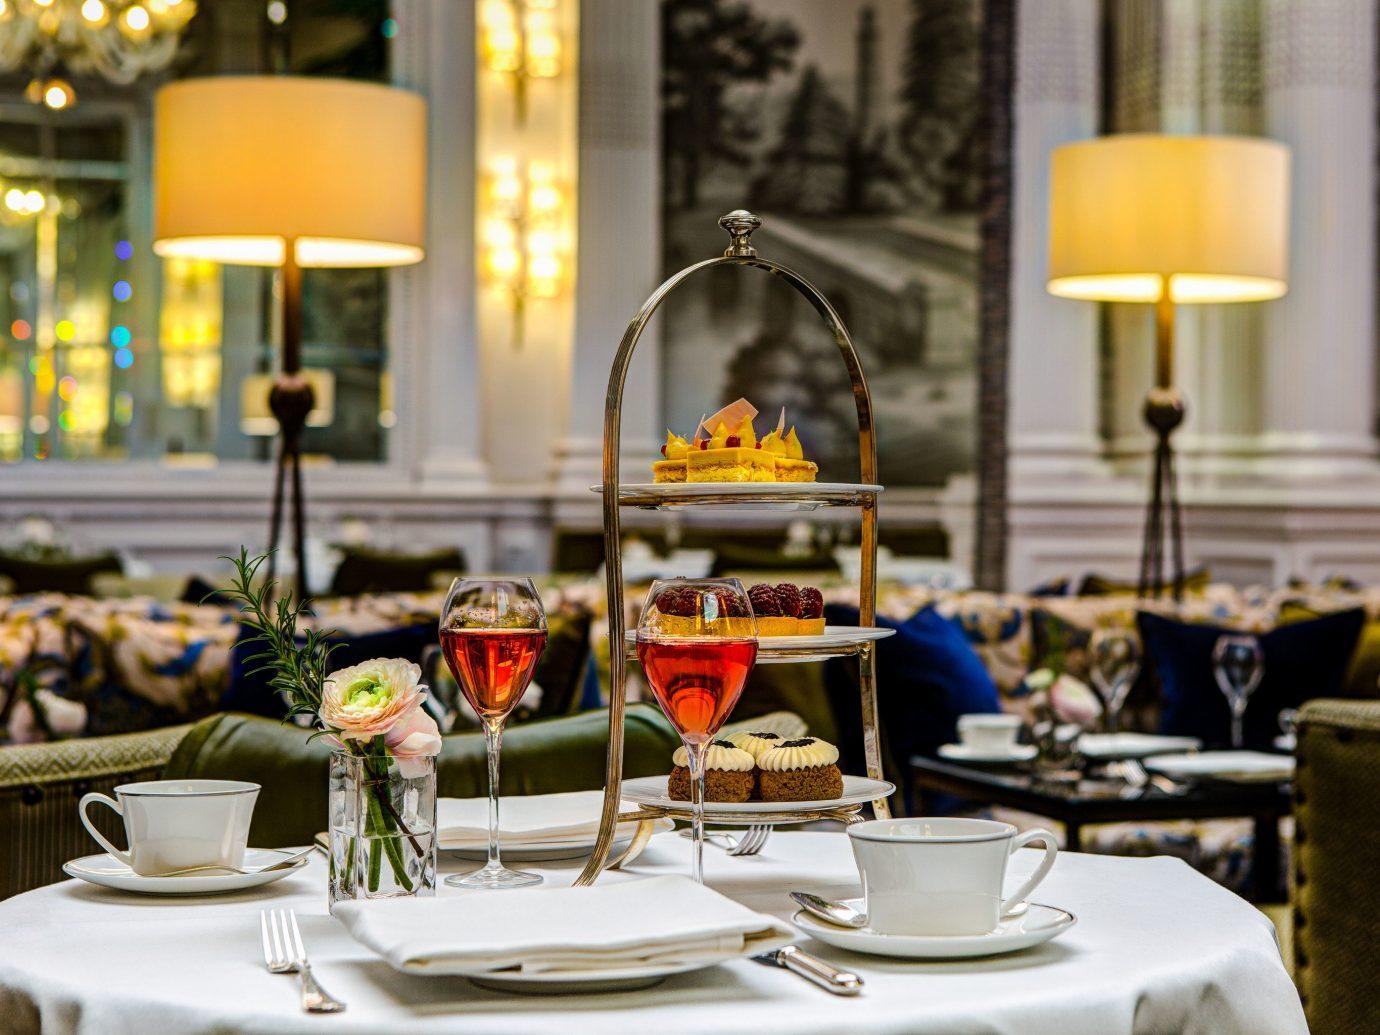 Edinburgh Hotels Jetsetter Guides Scotland Travel Tips Trip Ideas brunch restaurant meal table interior design tableware furniture breakfast food